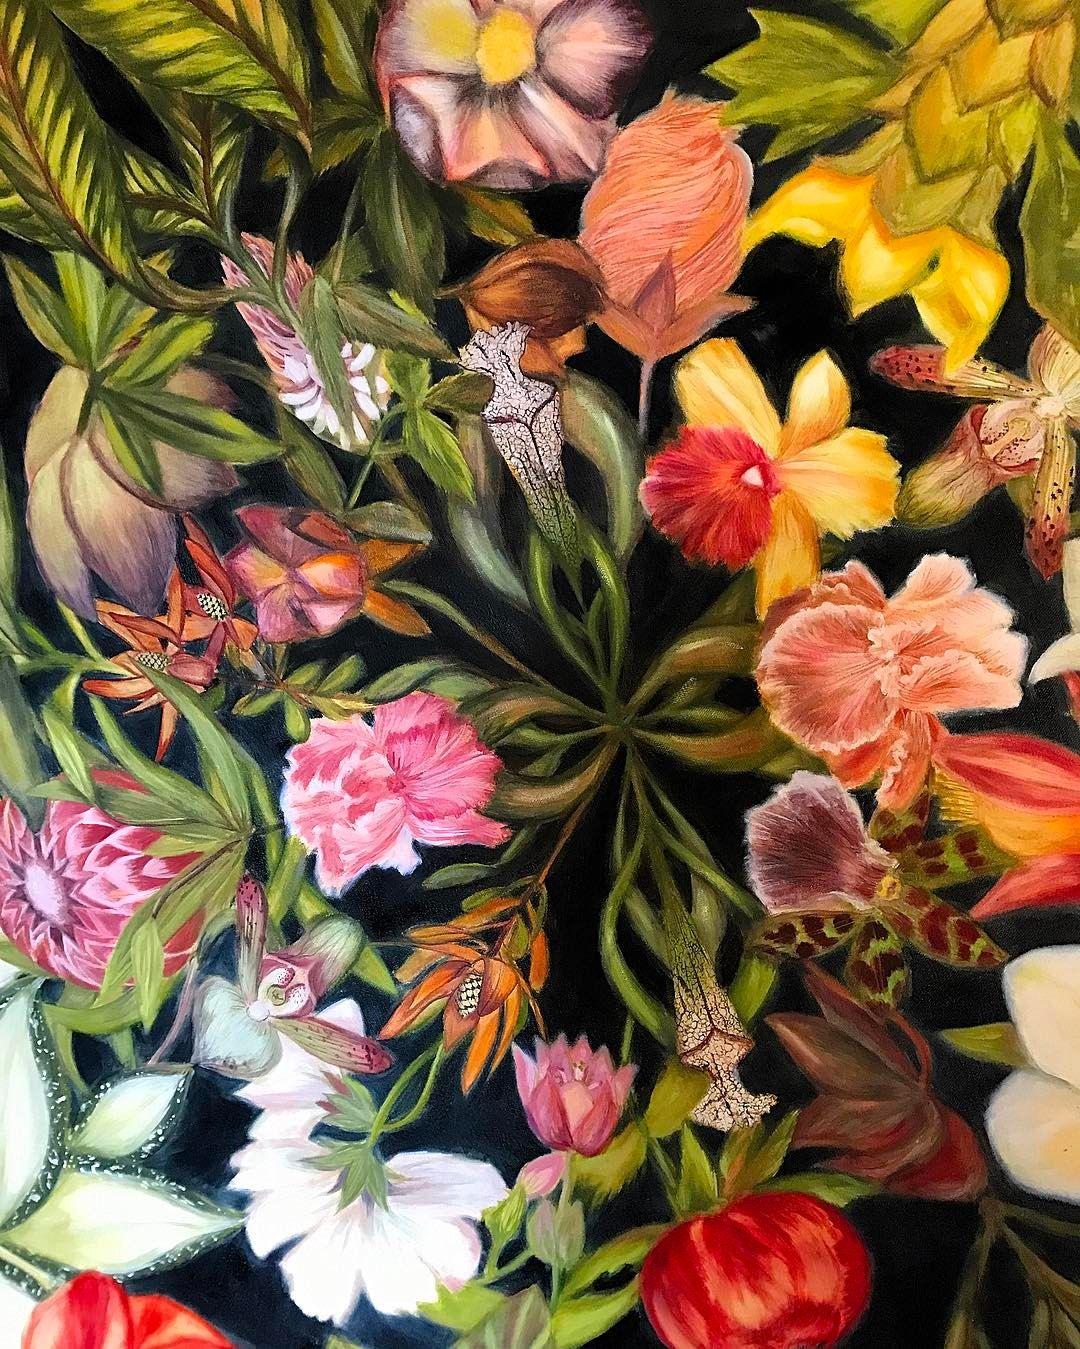 Pin by Velia De Iuliis on Velia De Iuliis | Flowers, Art, Plants